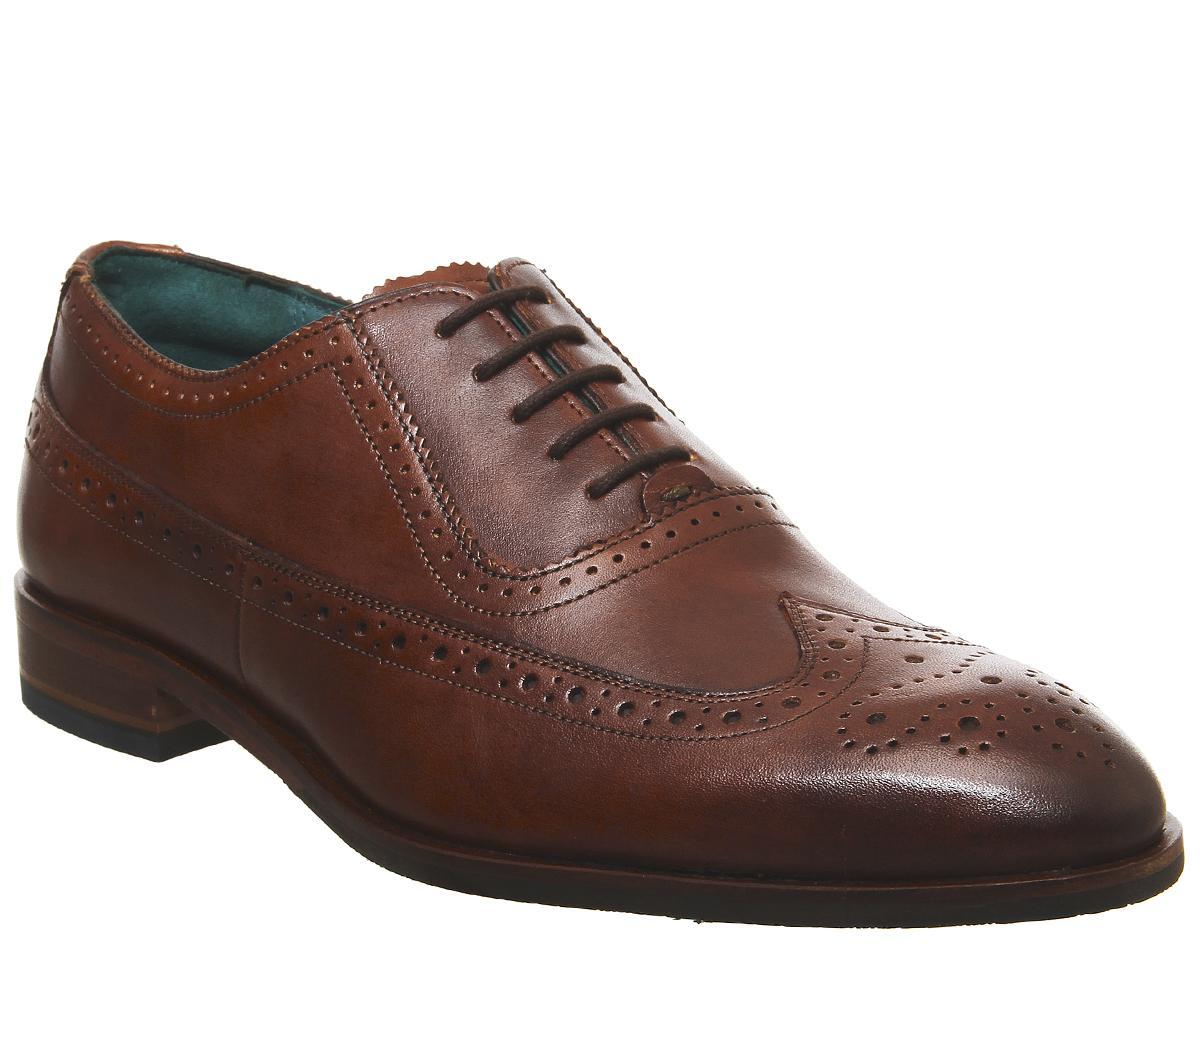 Asonce Brogue Shoes